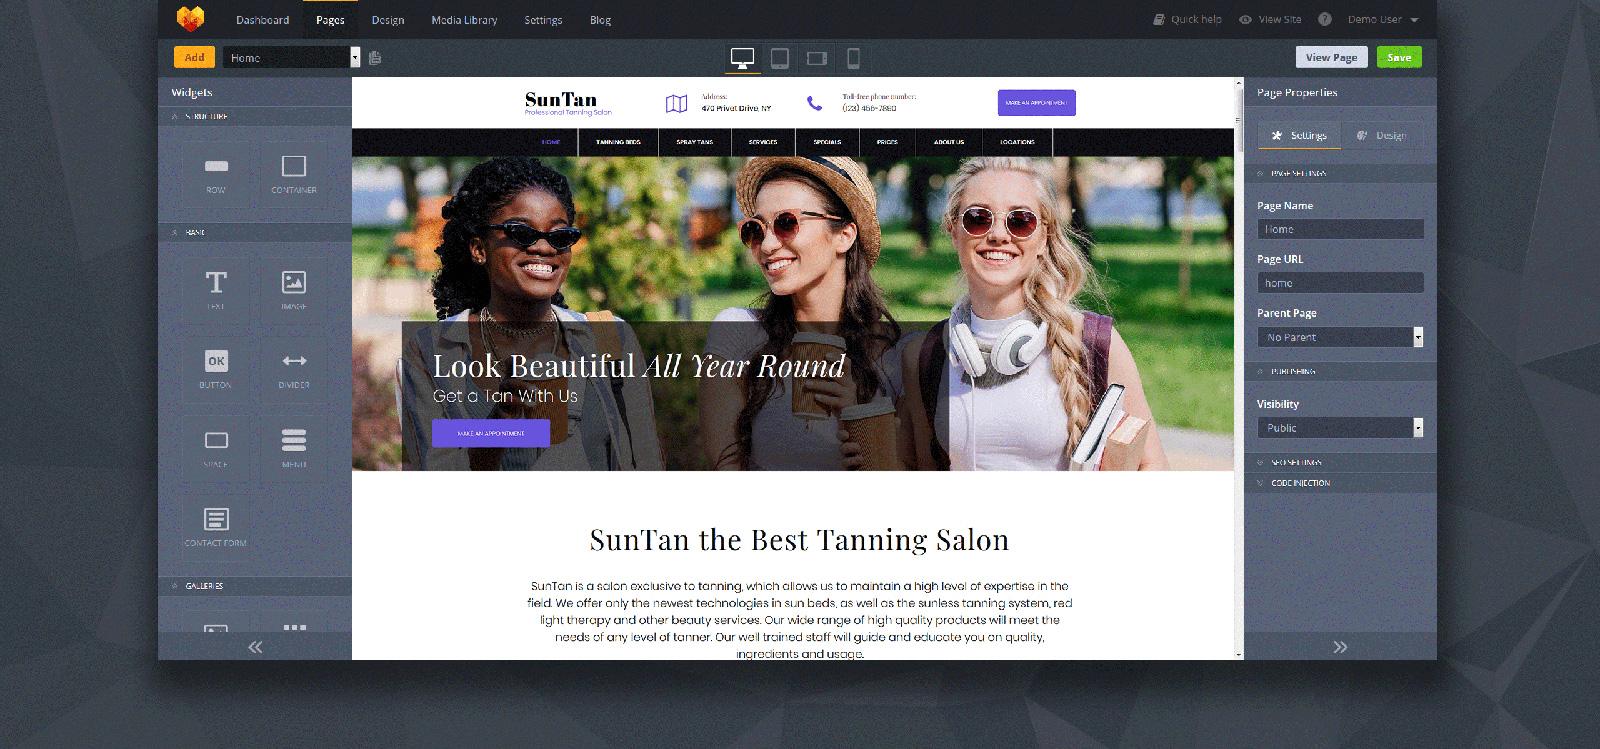 SunTan - Tanning Salon Moto CMS 3 Template